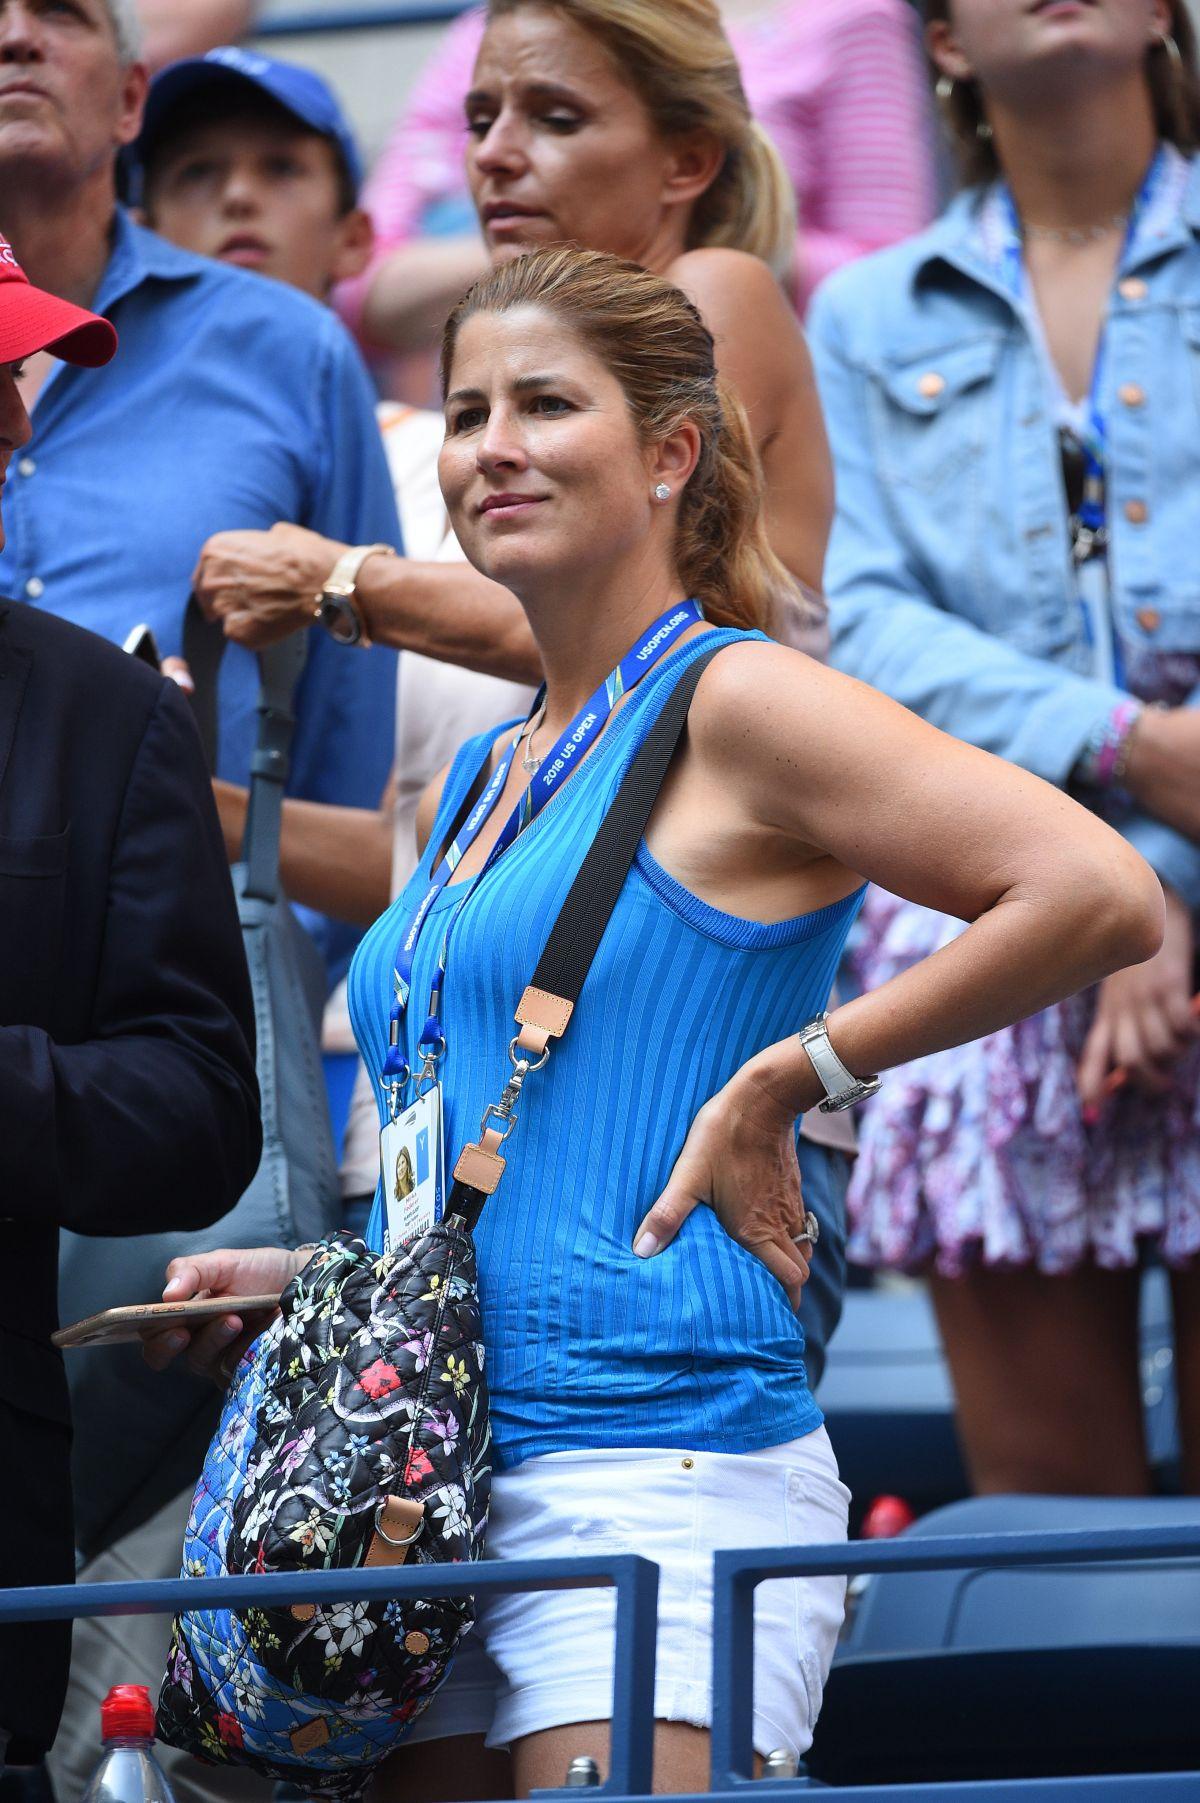 Us Open Tennis 2020 Federer